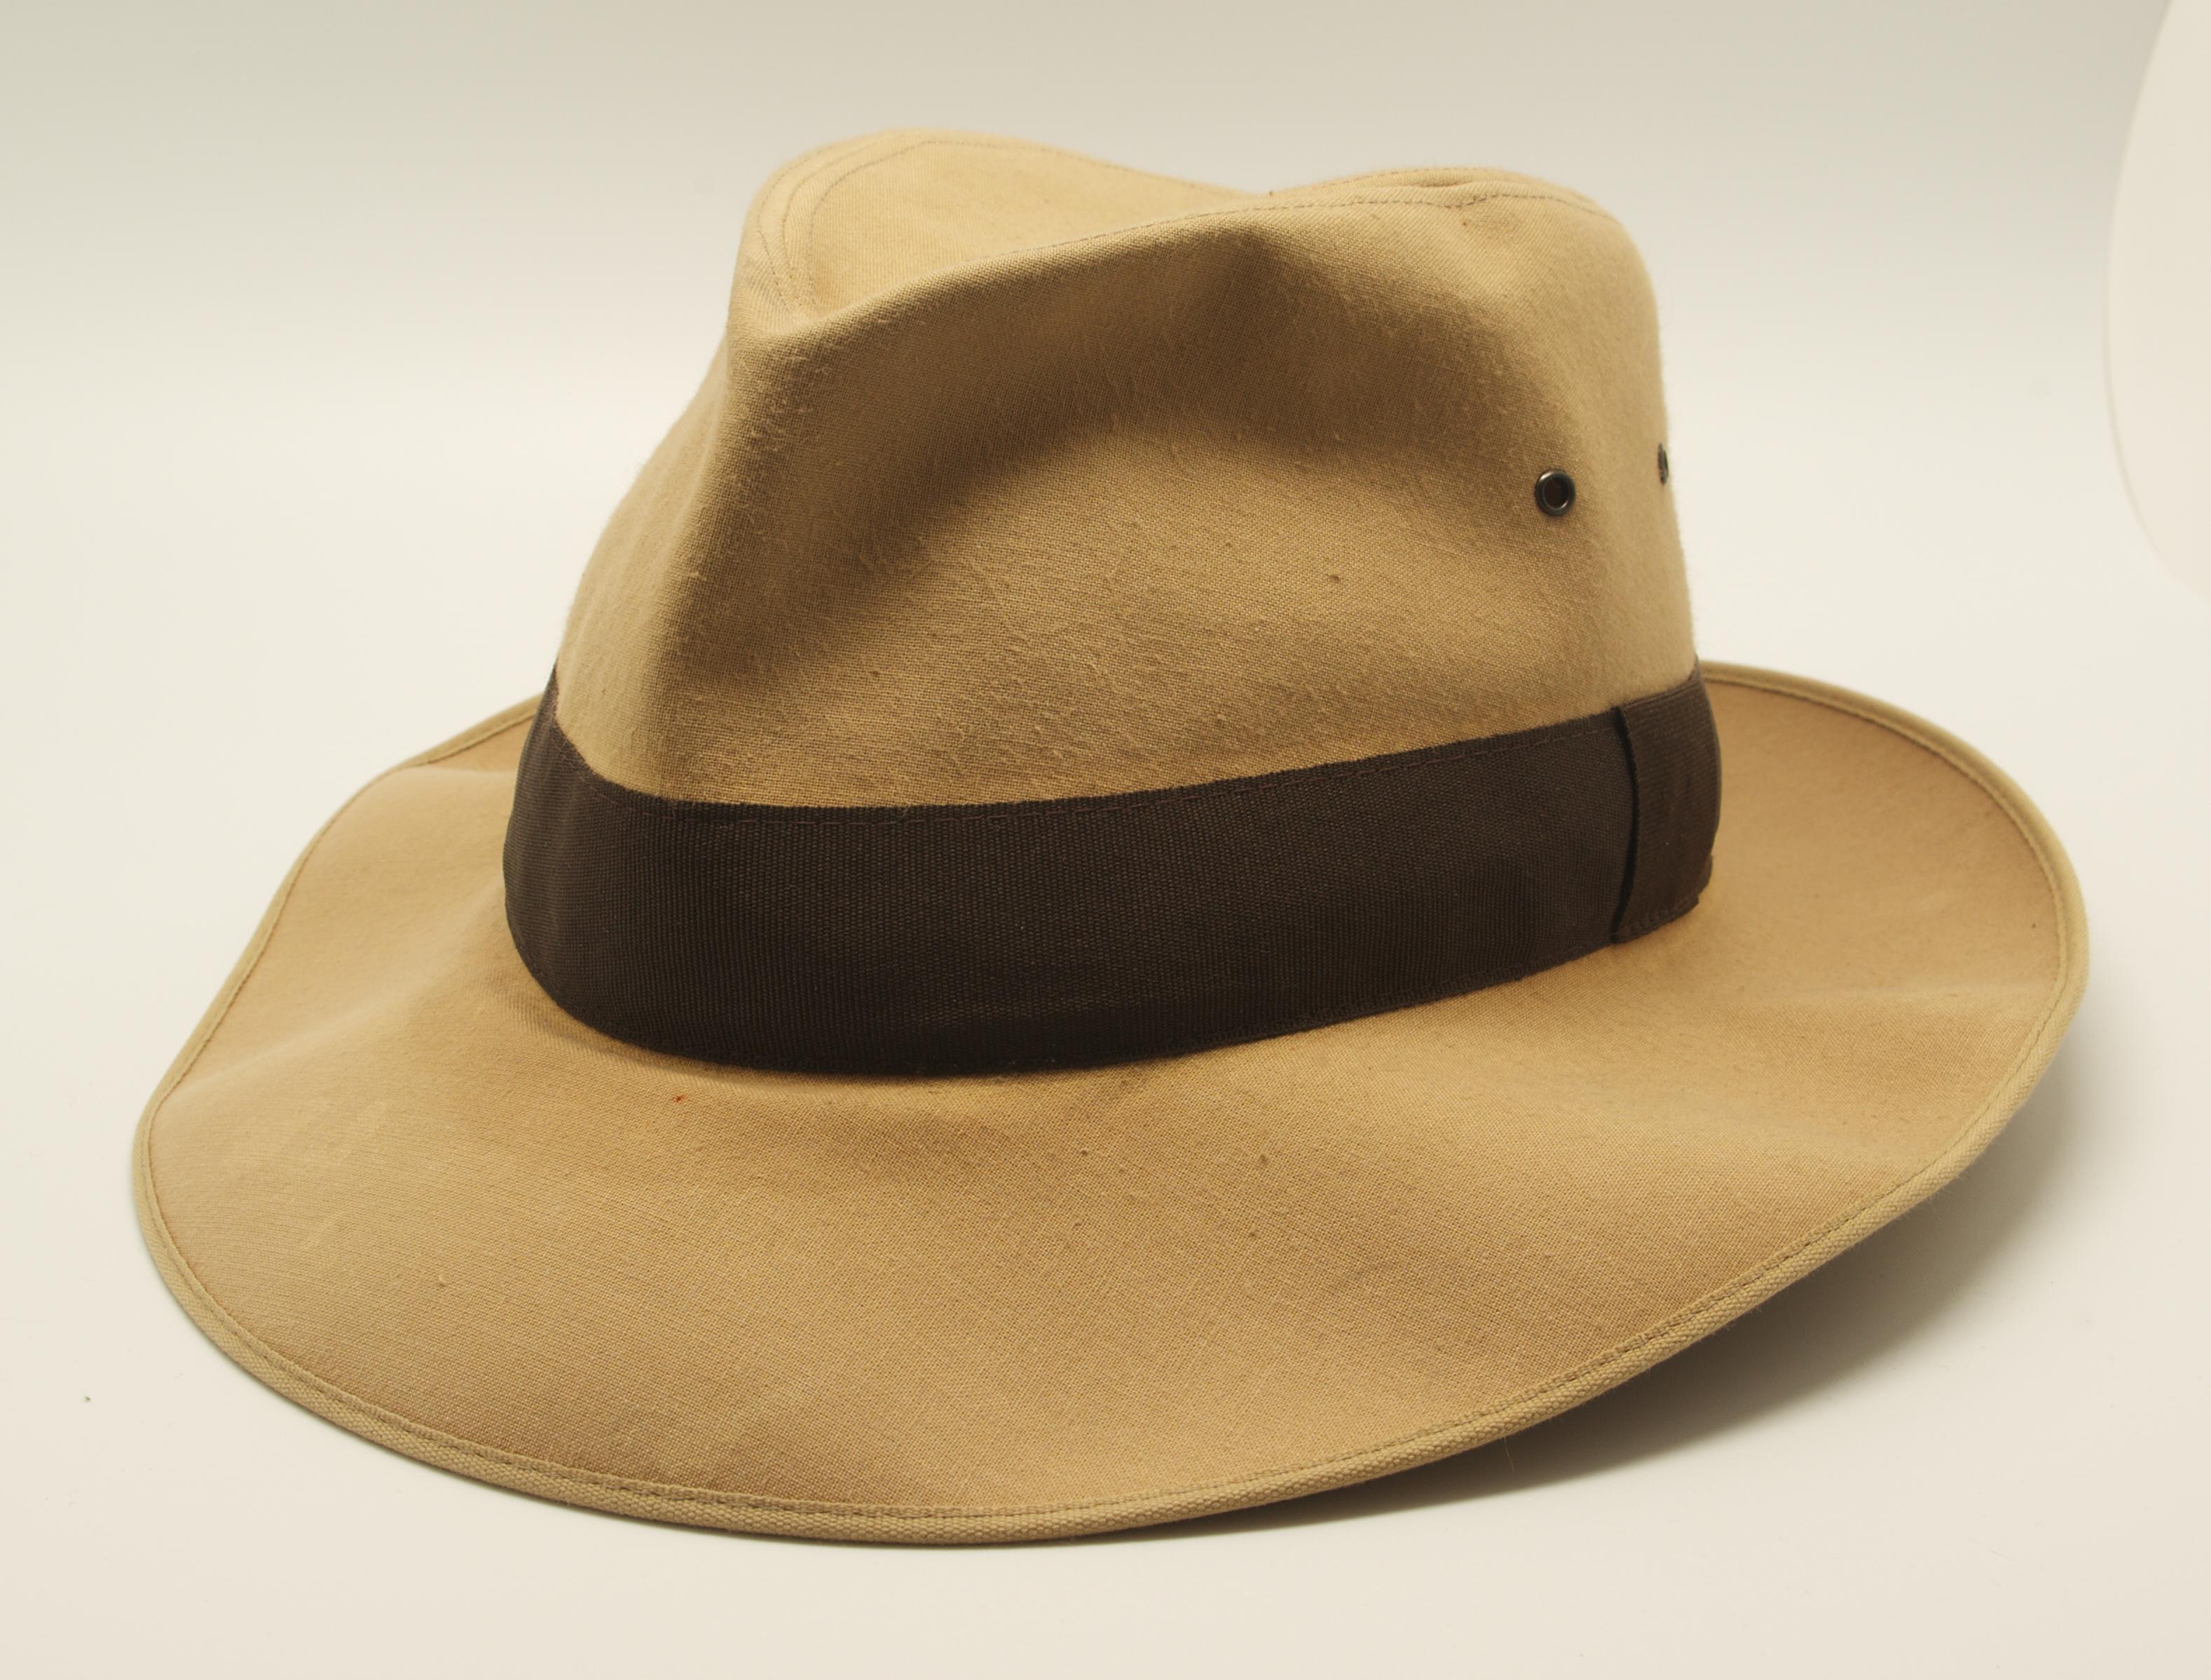 FileIndiana Jones Fedora Hat